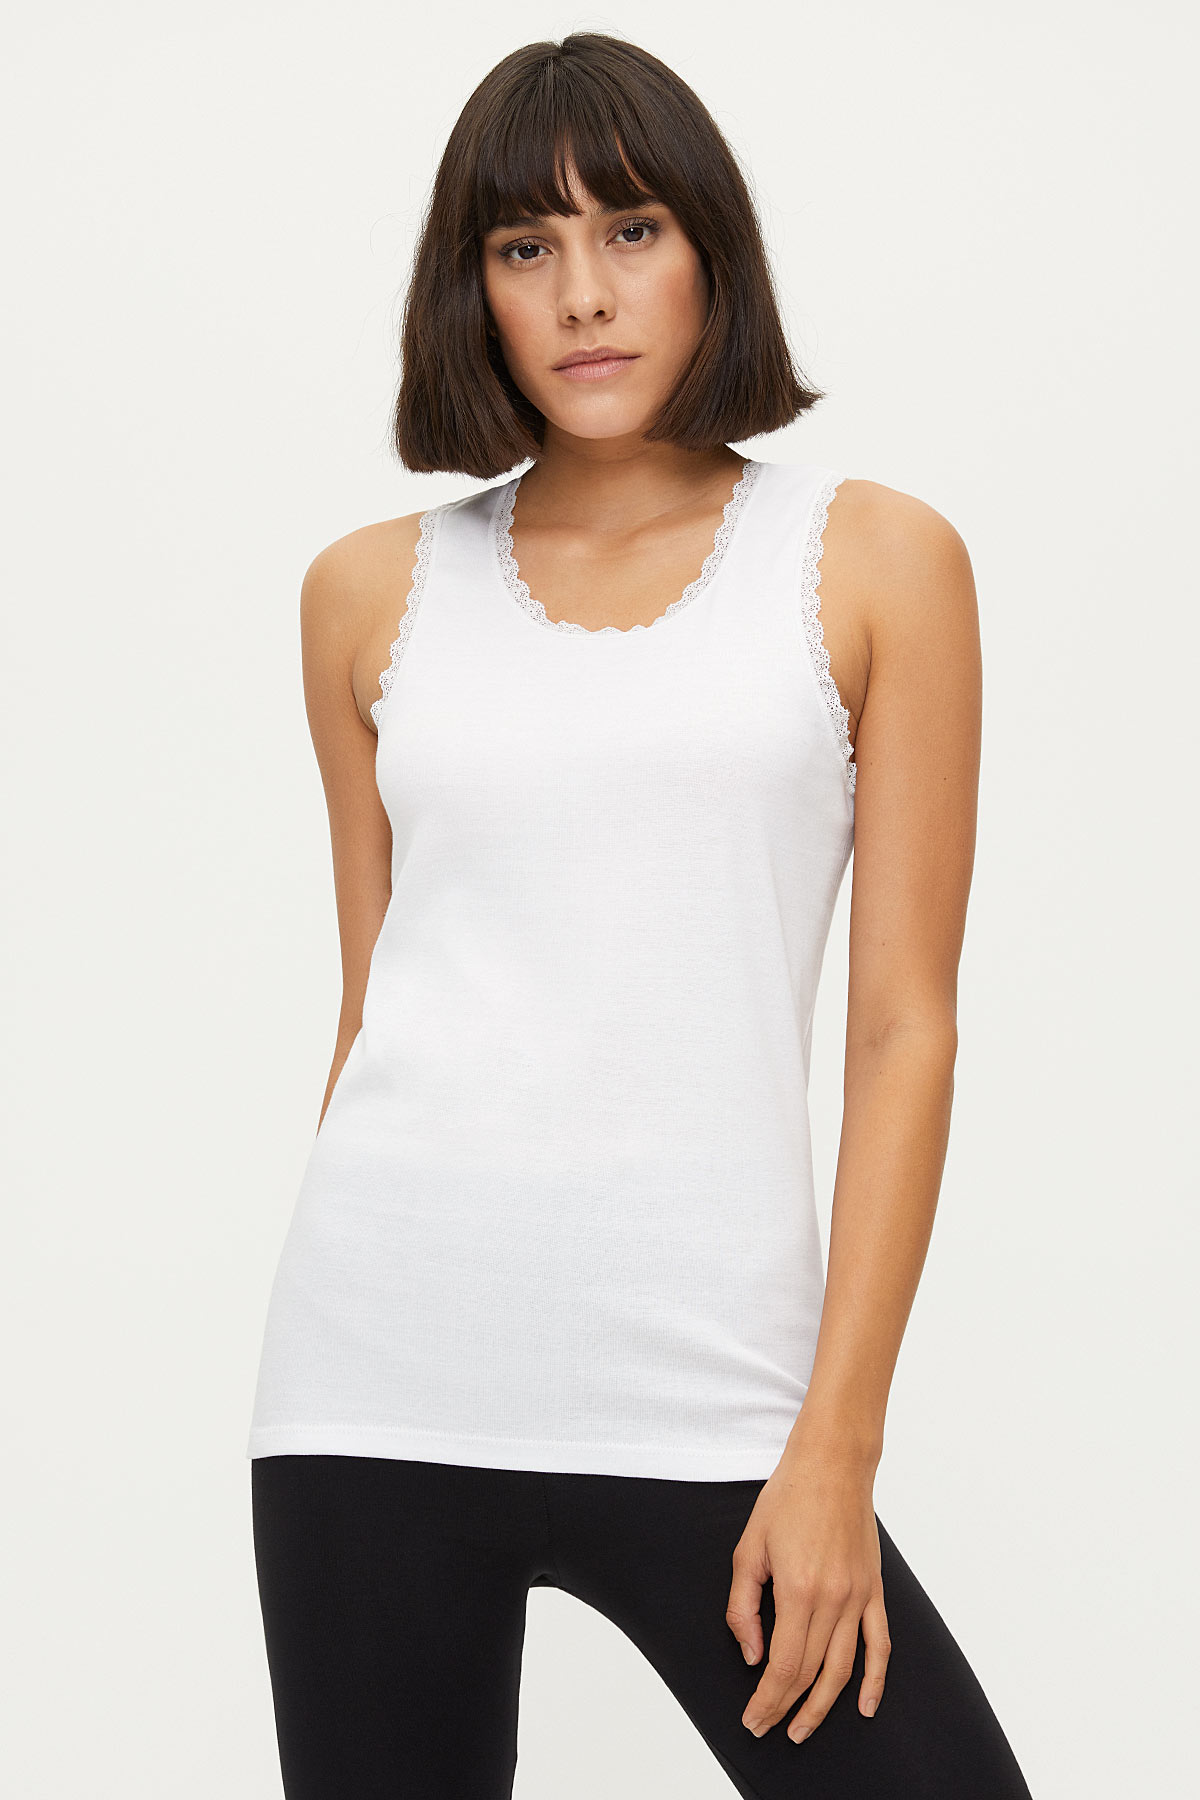 Bross - 1034 % 100 Baumwolle Wide Strappy Ladies Lacy Unterhemd